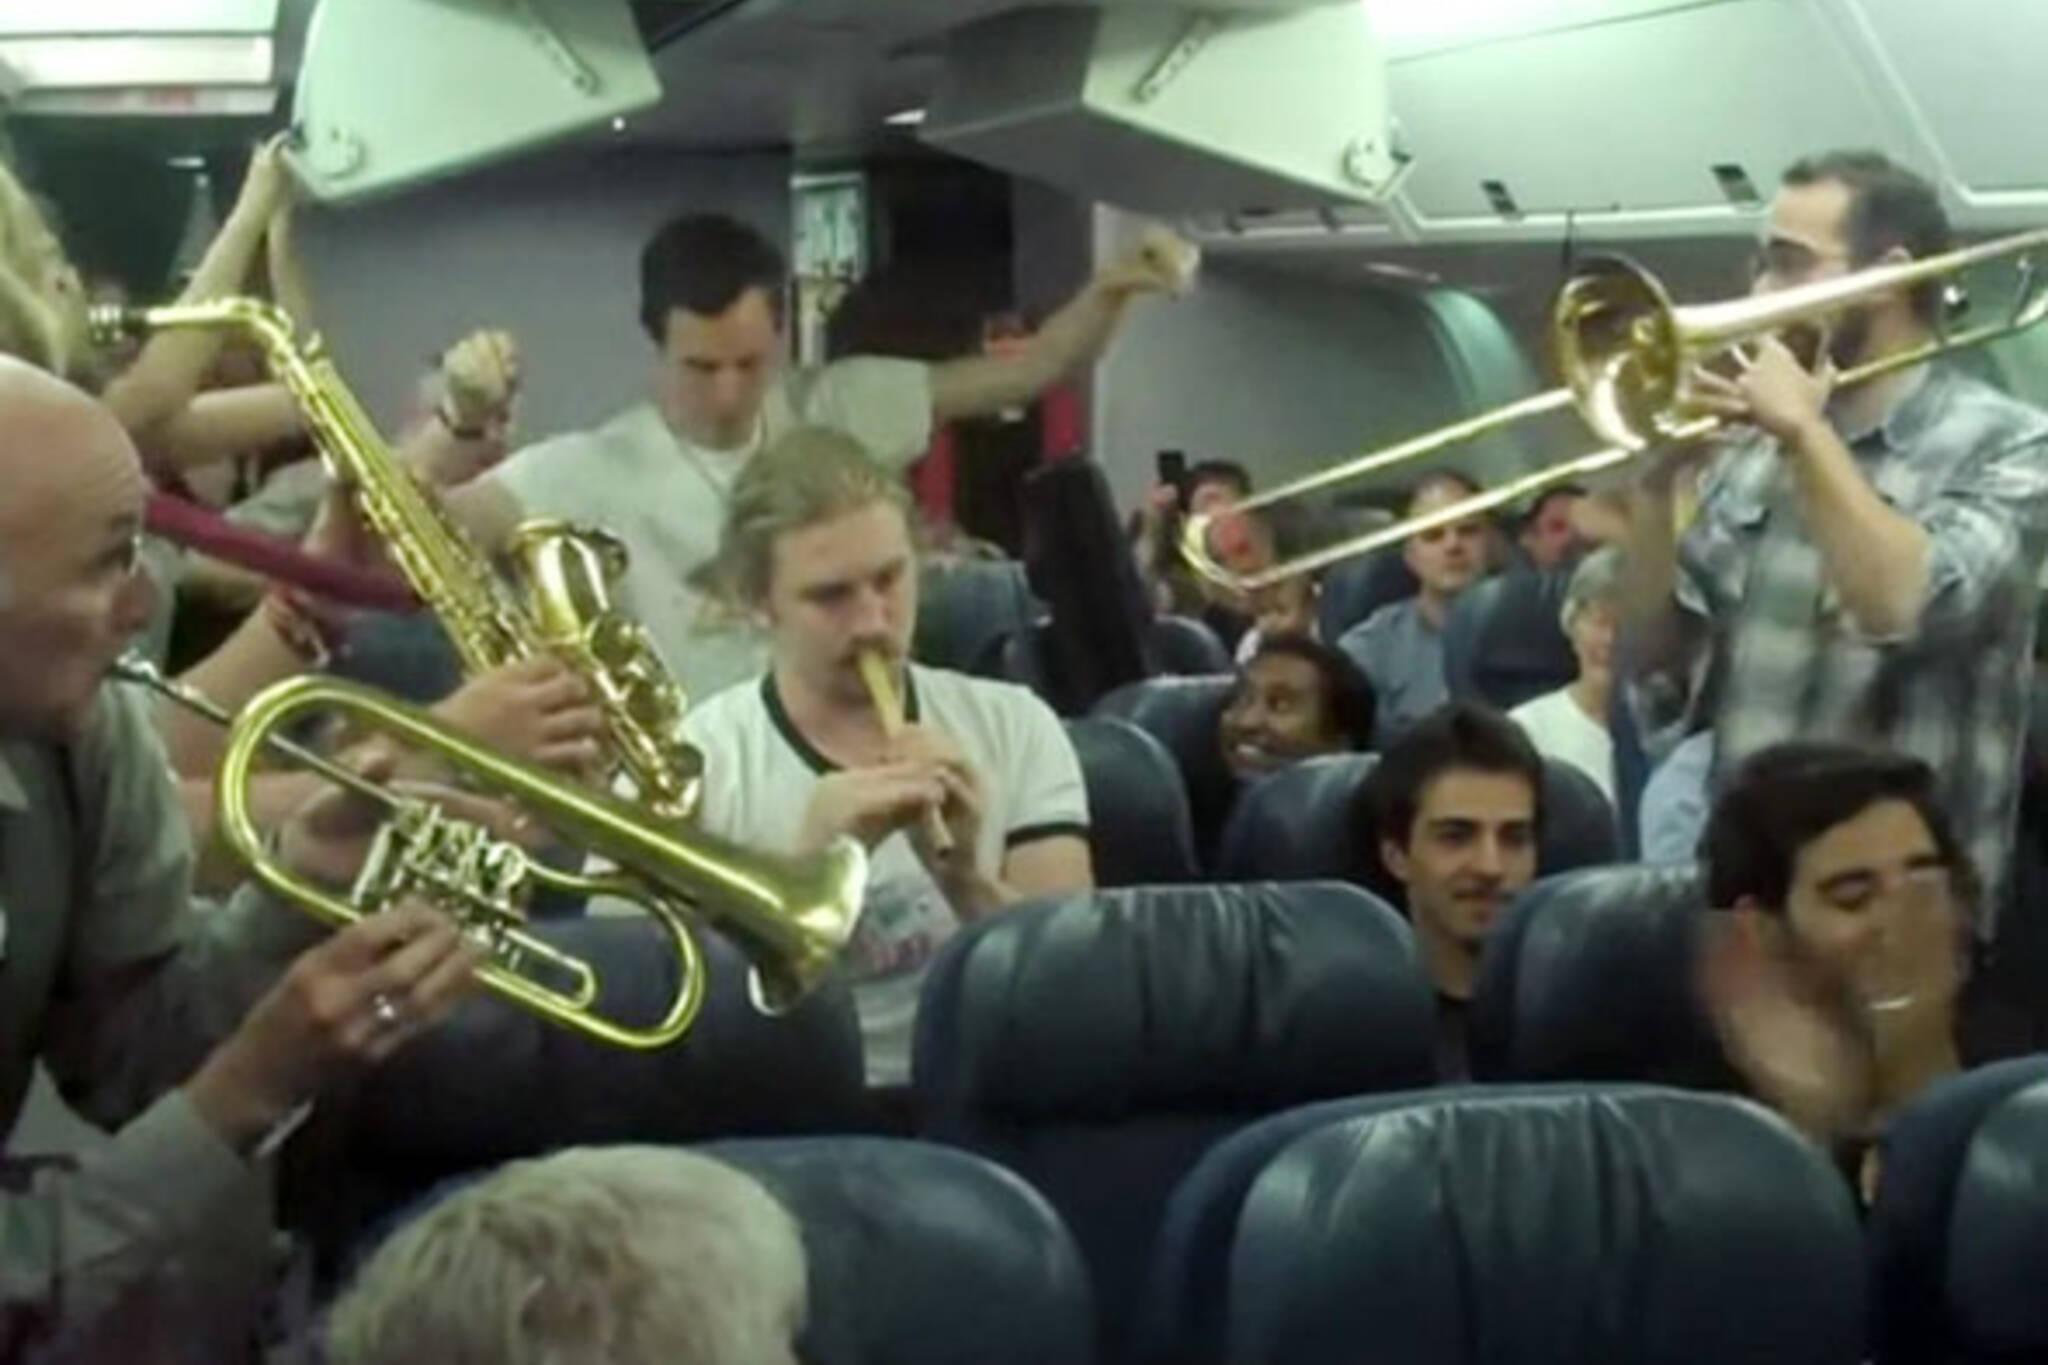 Music on a plane